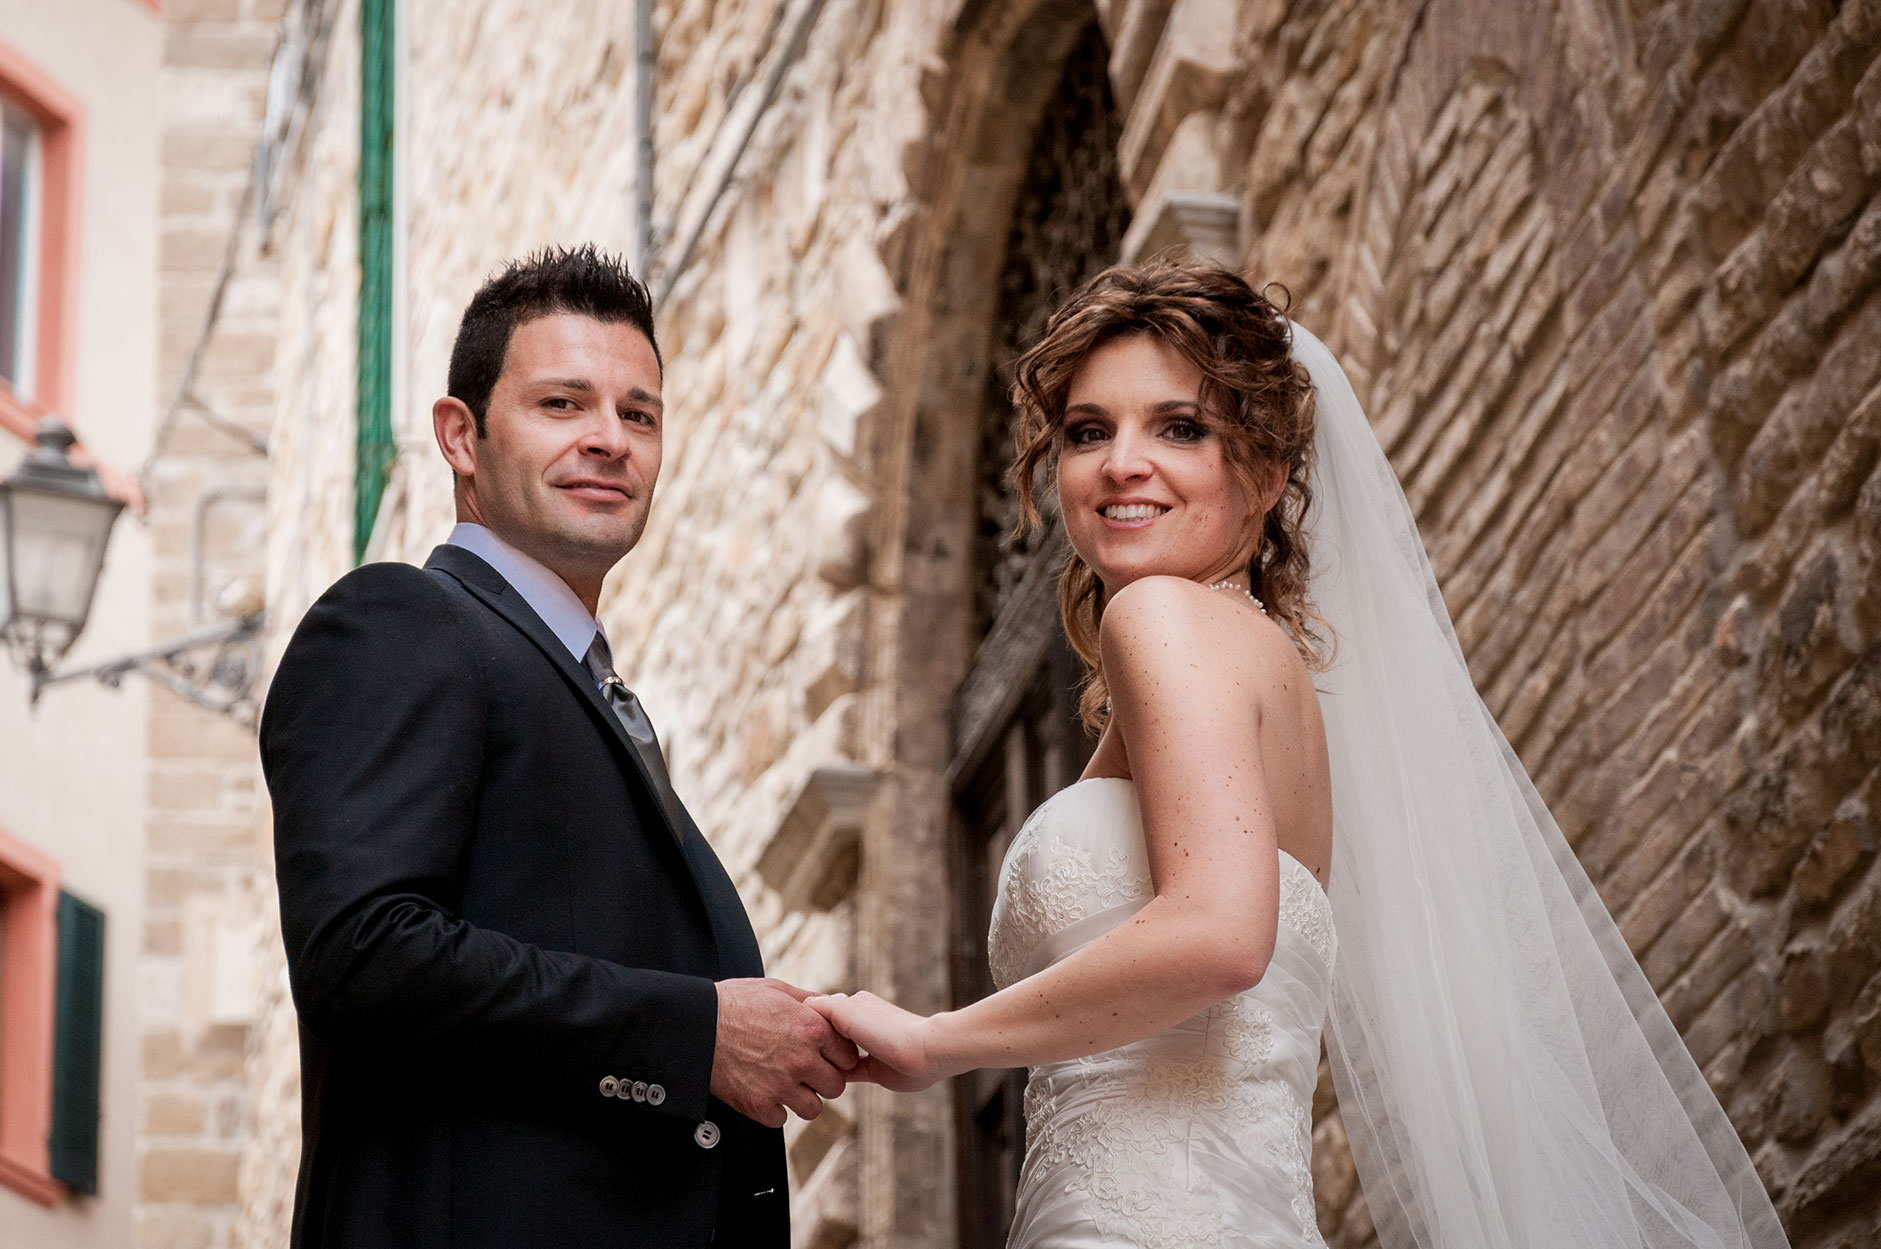 Francesca-Ferrati-wedding-photographer-Verona-Federica-Giovanni20